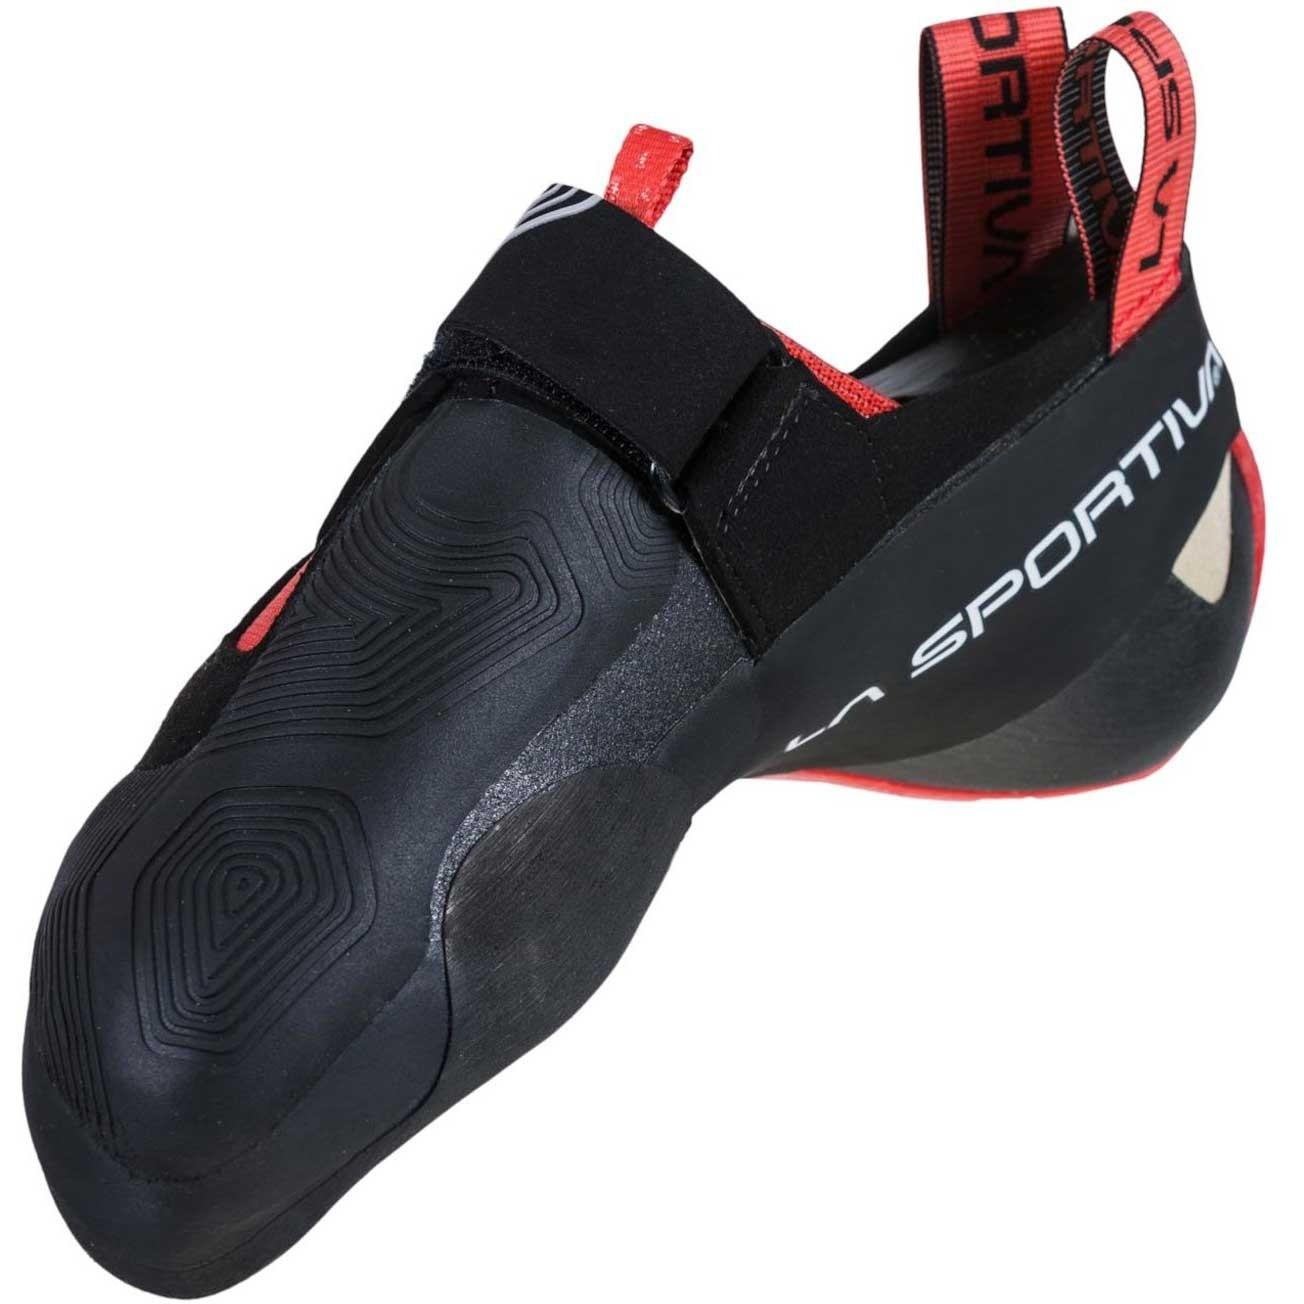 La Sportiva Theory Climbing Shoe - Women's - Black/Hibiscus